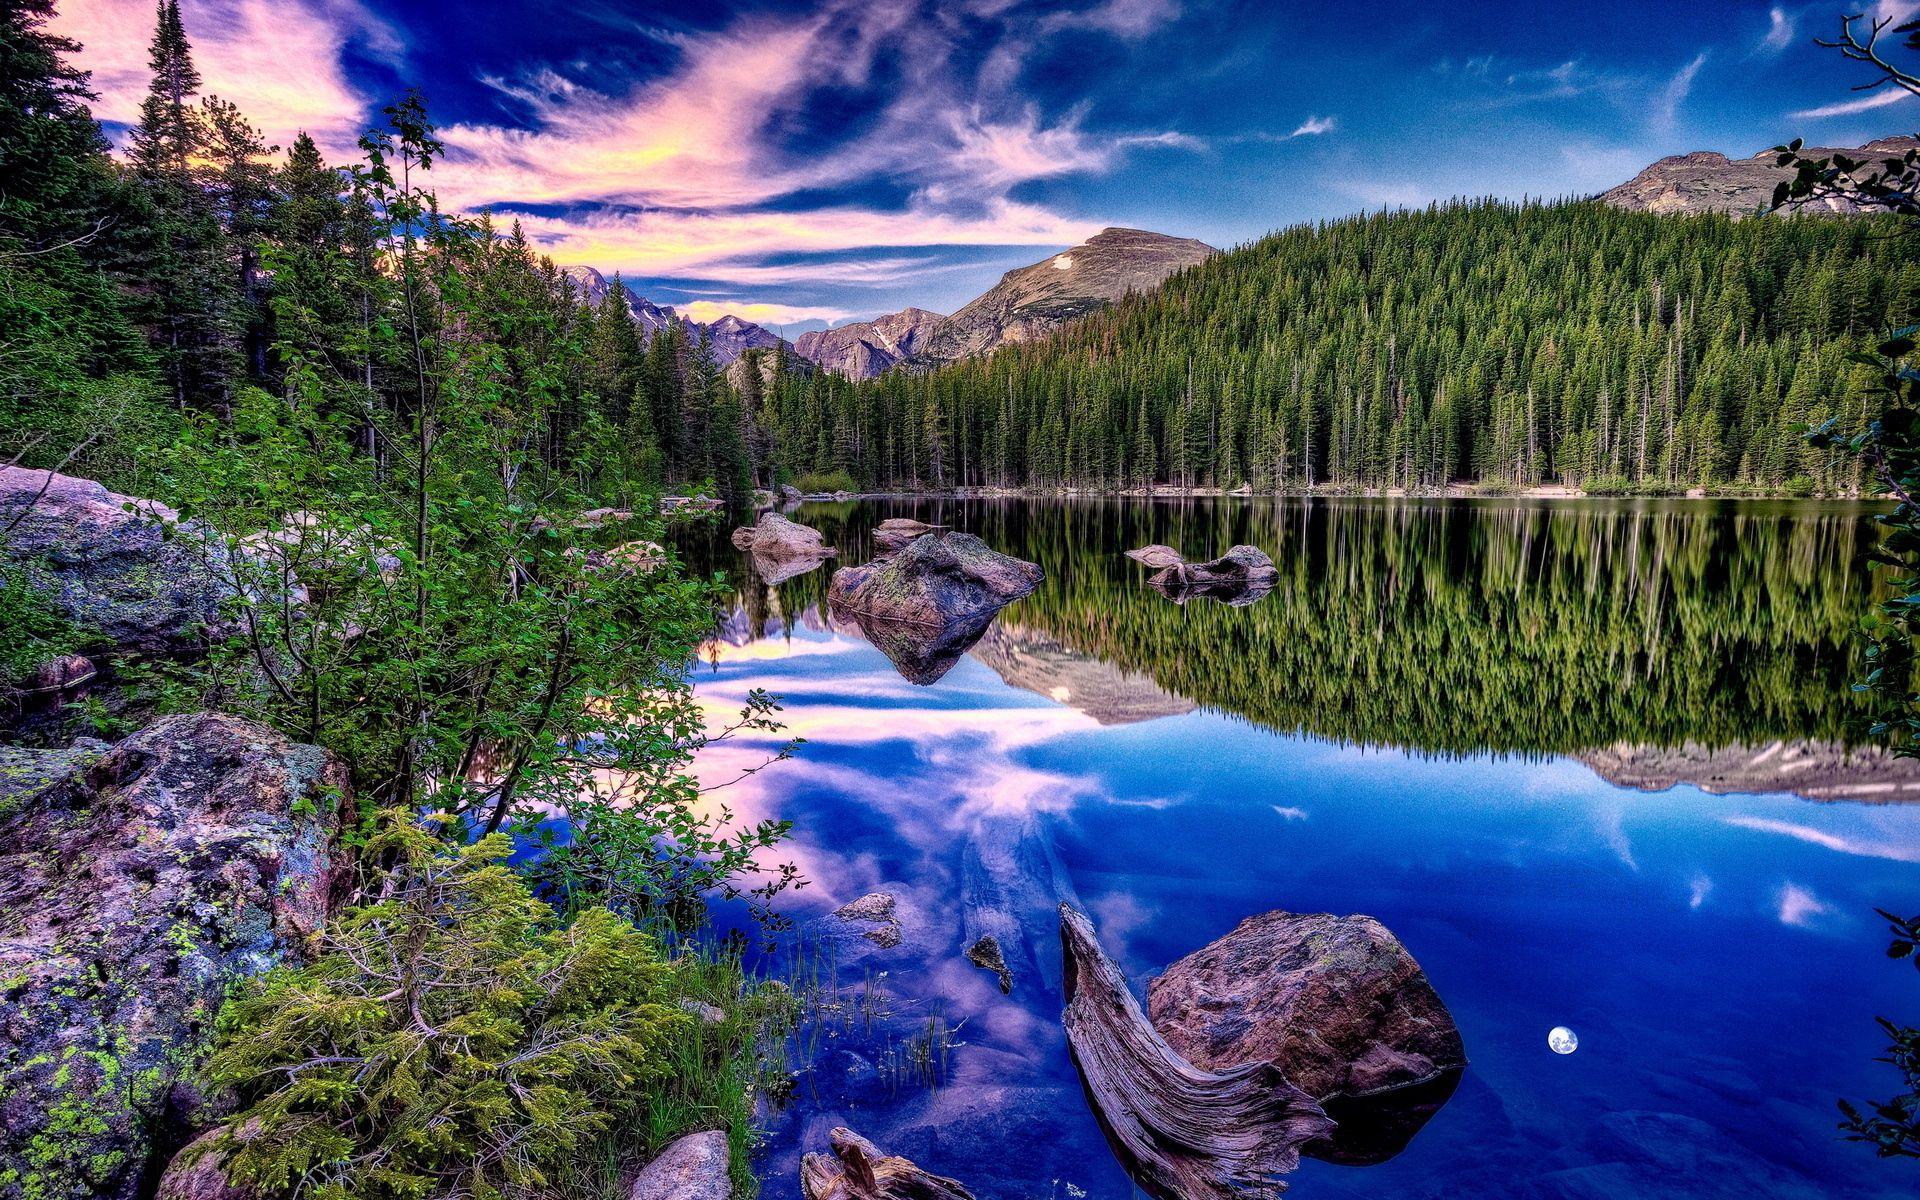 94911 скачать обои Небо, Лес, Камни, Отражение, Берег, Зеркало, Природа, Горы, Облака, Озеро, Ярко, Коряга, Контраст - заставки и картинки бесплатно